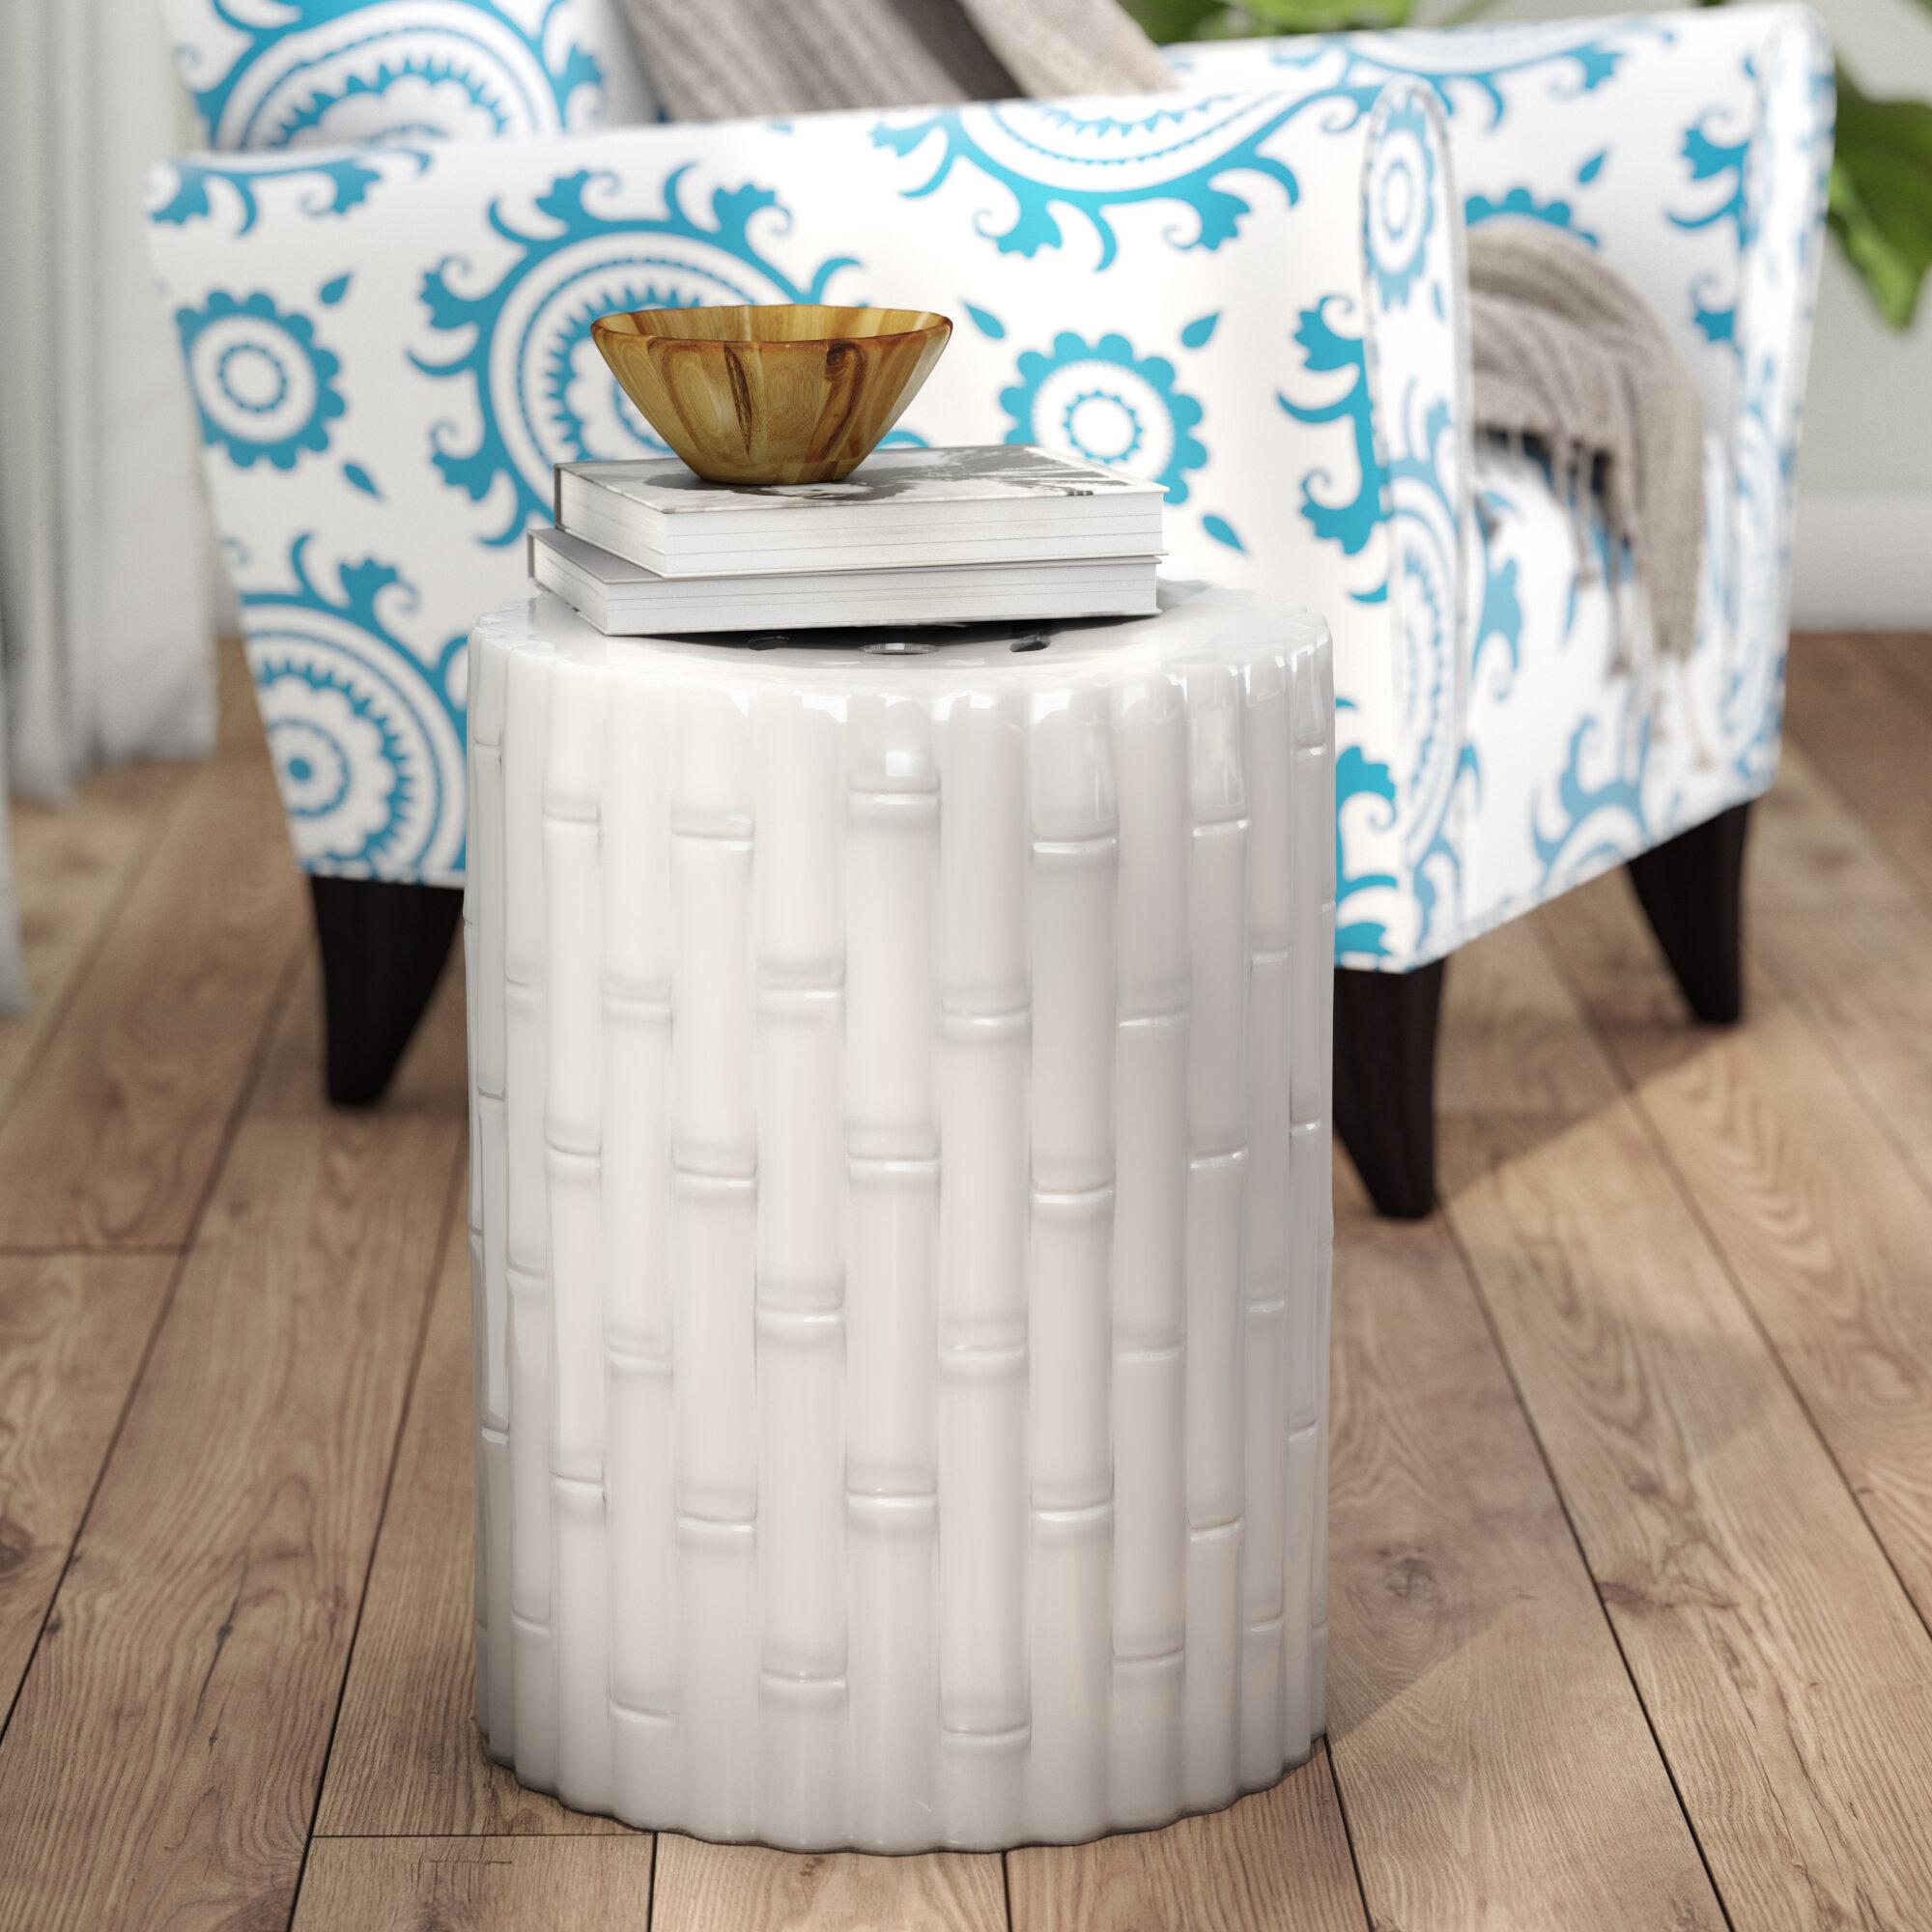 Ceramic White Garden Stools You'Ll Love In 2020 | Wayfair For Middlet Owl Ceramic Garden Stools (View 13 of 25)